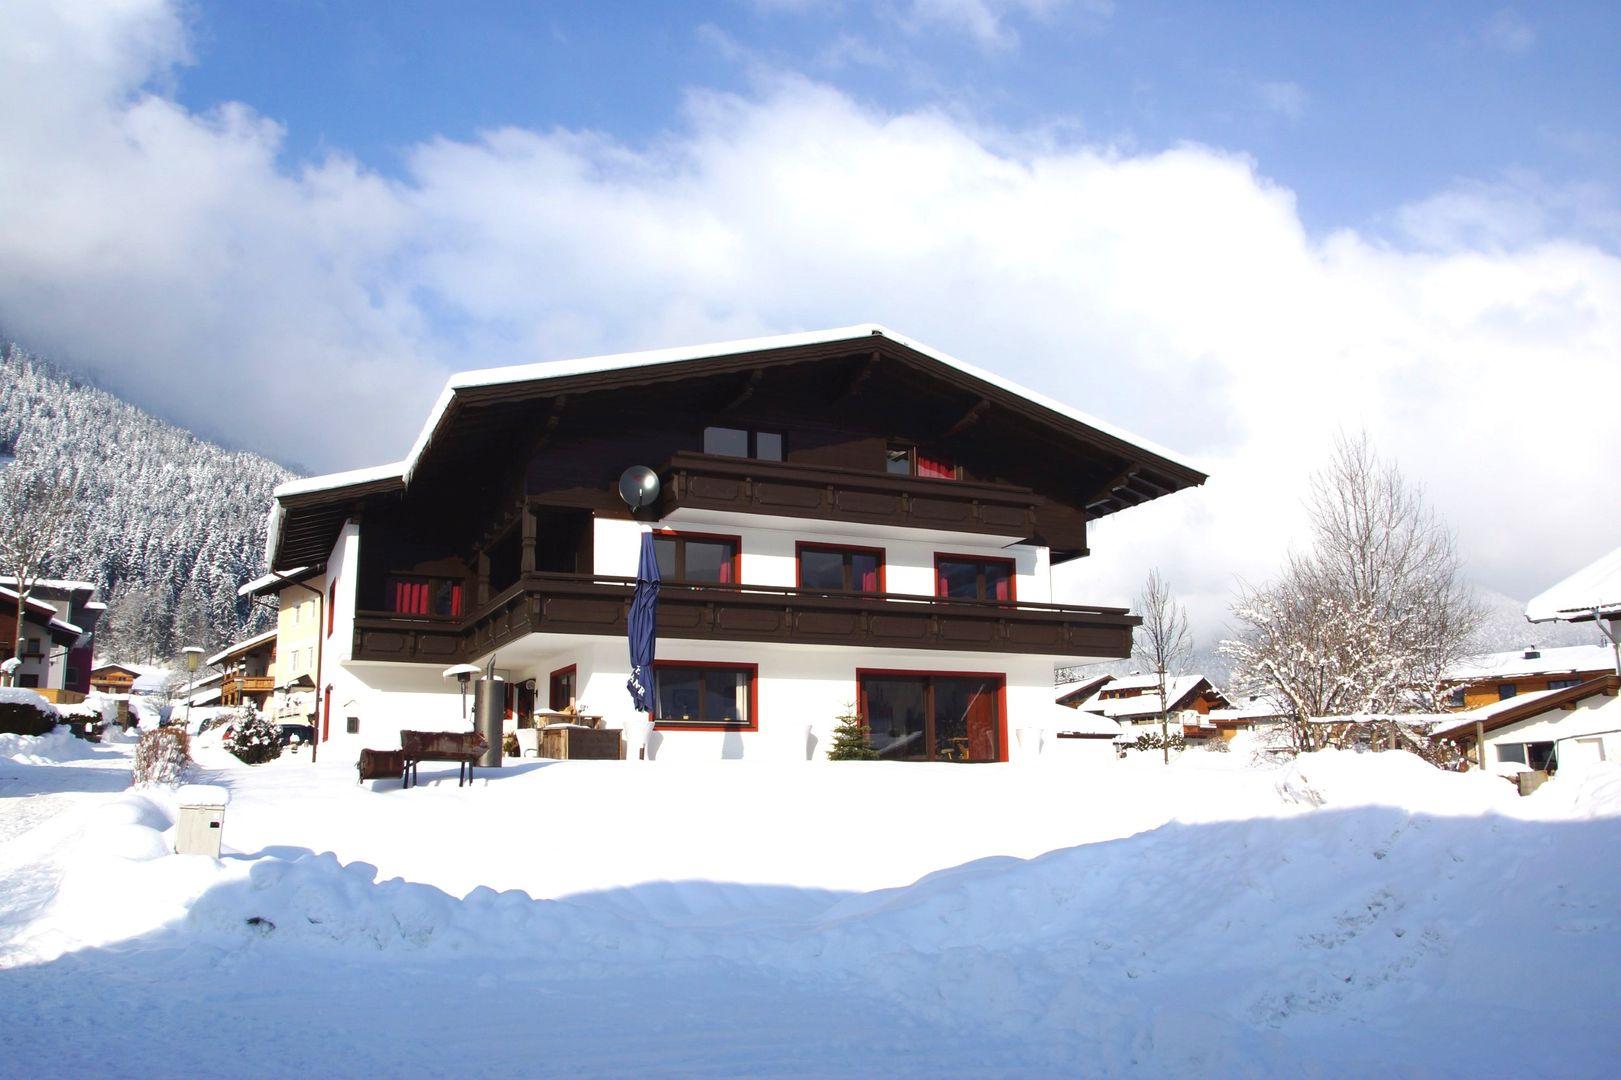 Pensions & Apartments SkiWelt Wilder Kaiser - Slide 1